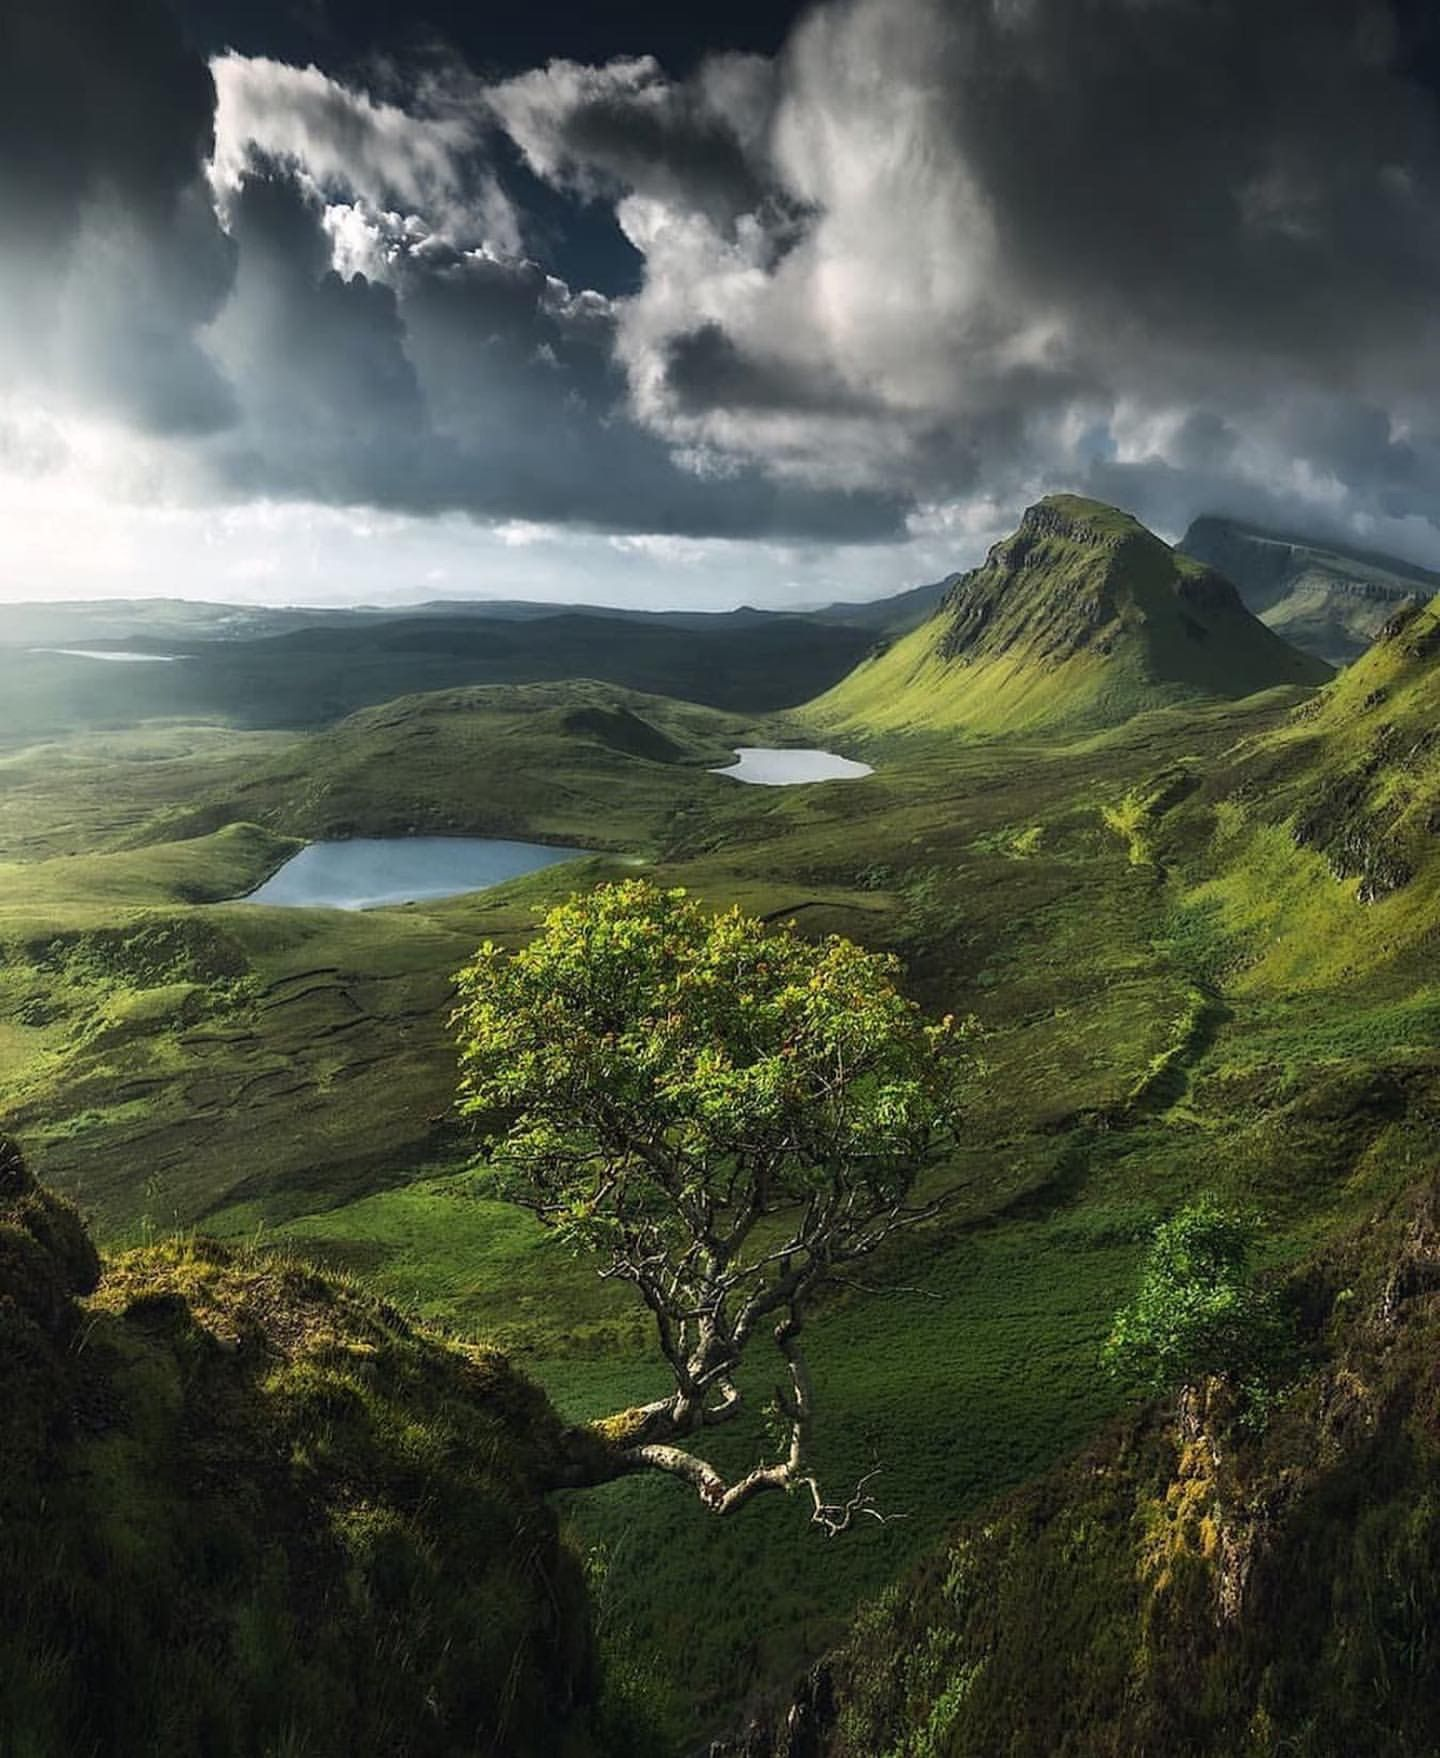 Isle Of Skye Scotland Photo Lukas Watschinger Watschinger Lukas Isle Of Skye Scenery Beautiful Nature